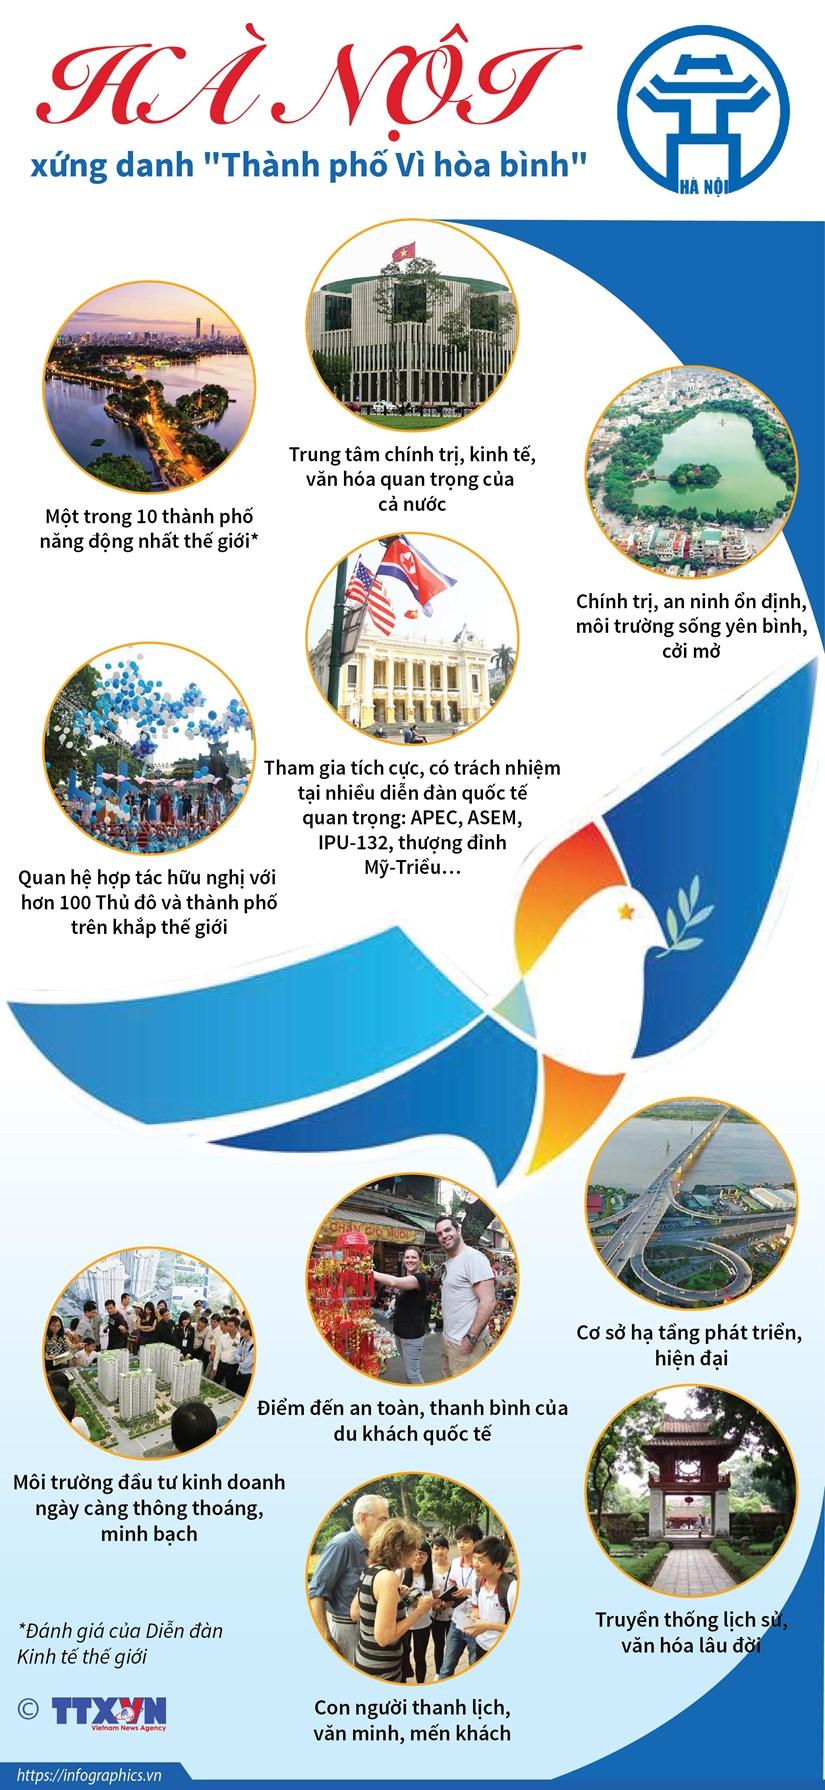 [Infographics] Ha Noi xung danh 'Thanh pho Vi hoa binh' hinh anh 1